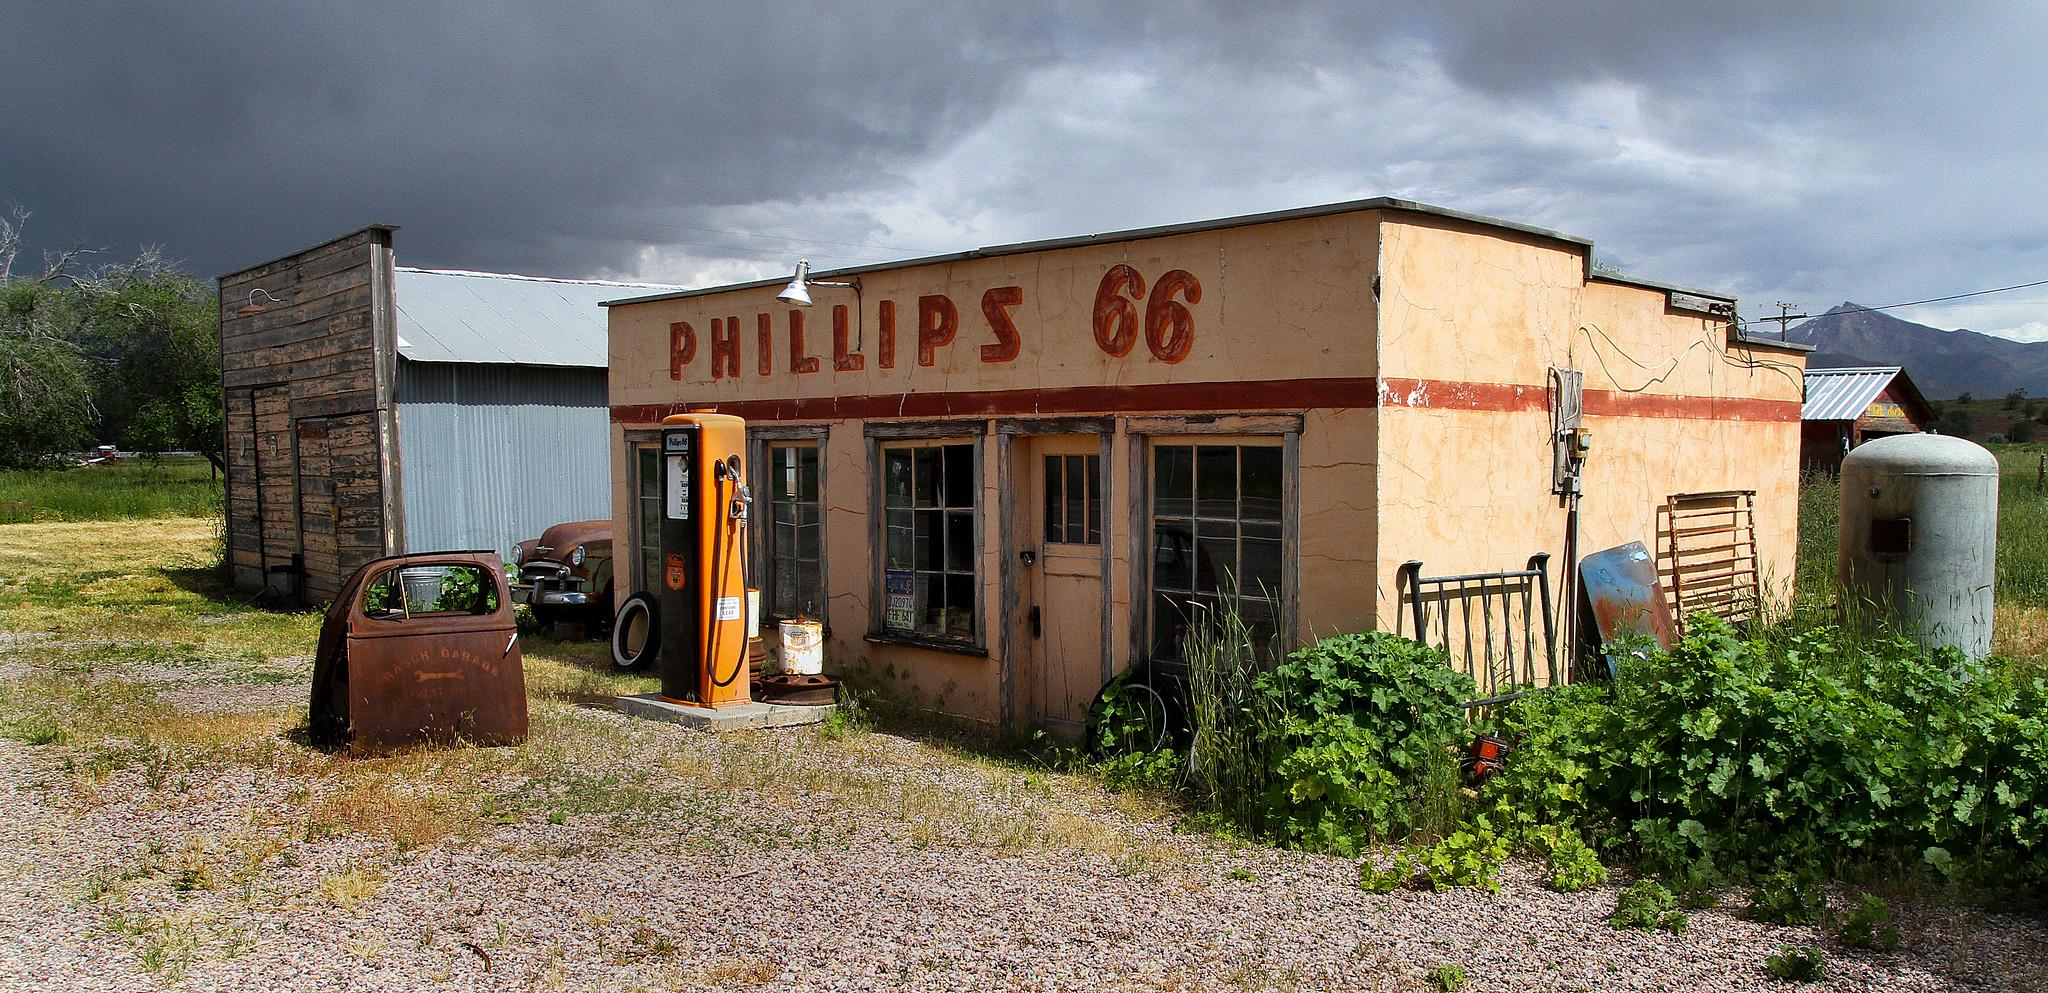 Phillips 66 - Leamington, Utah U.S.A. - May 27, 2016